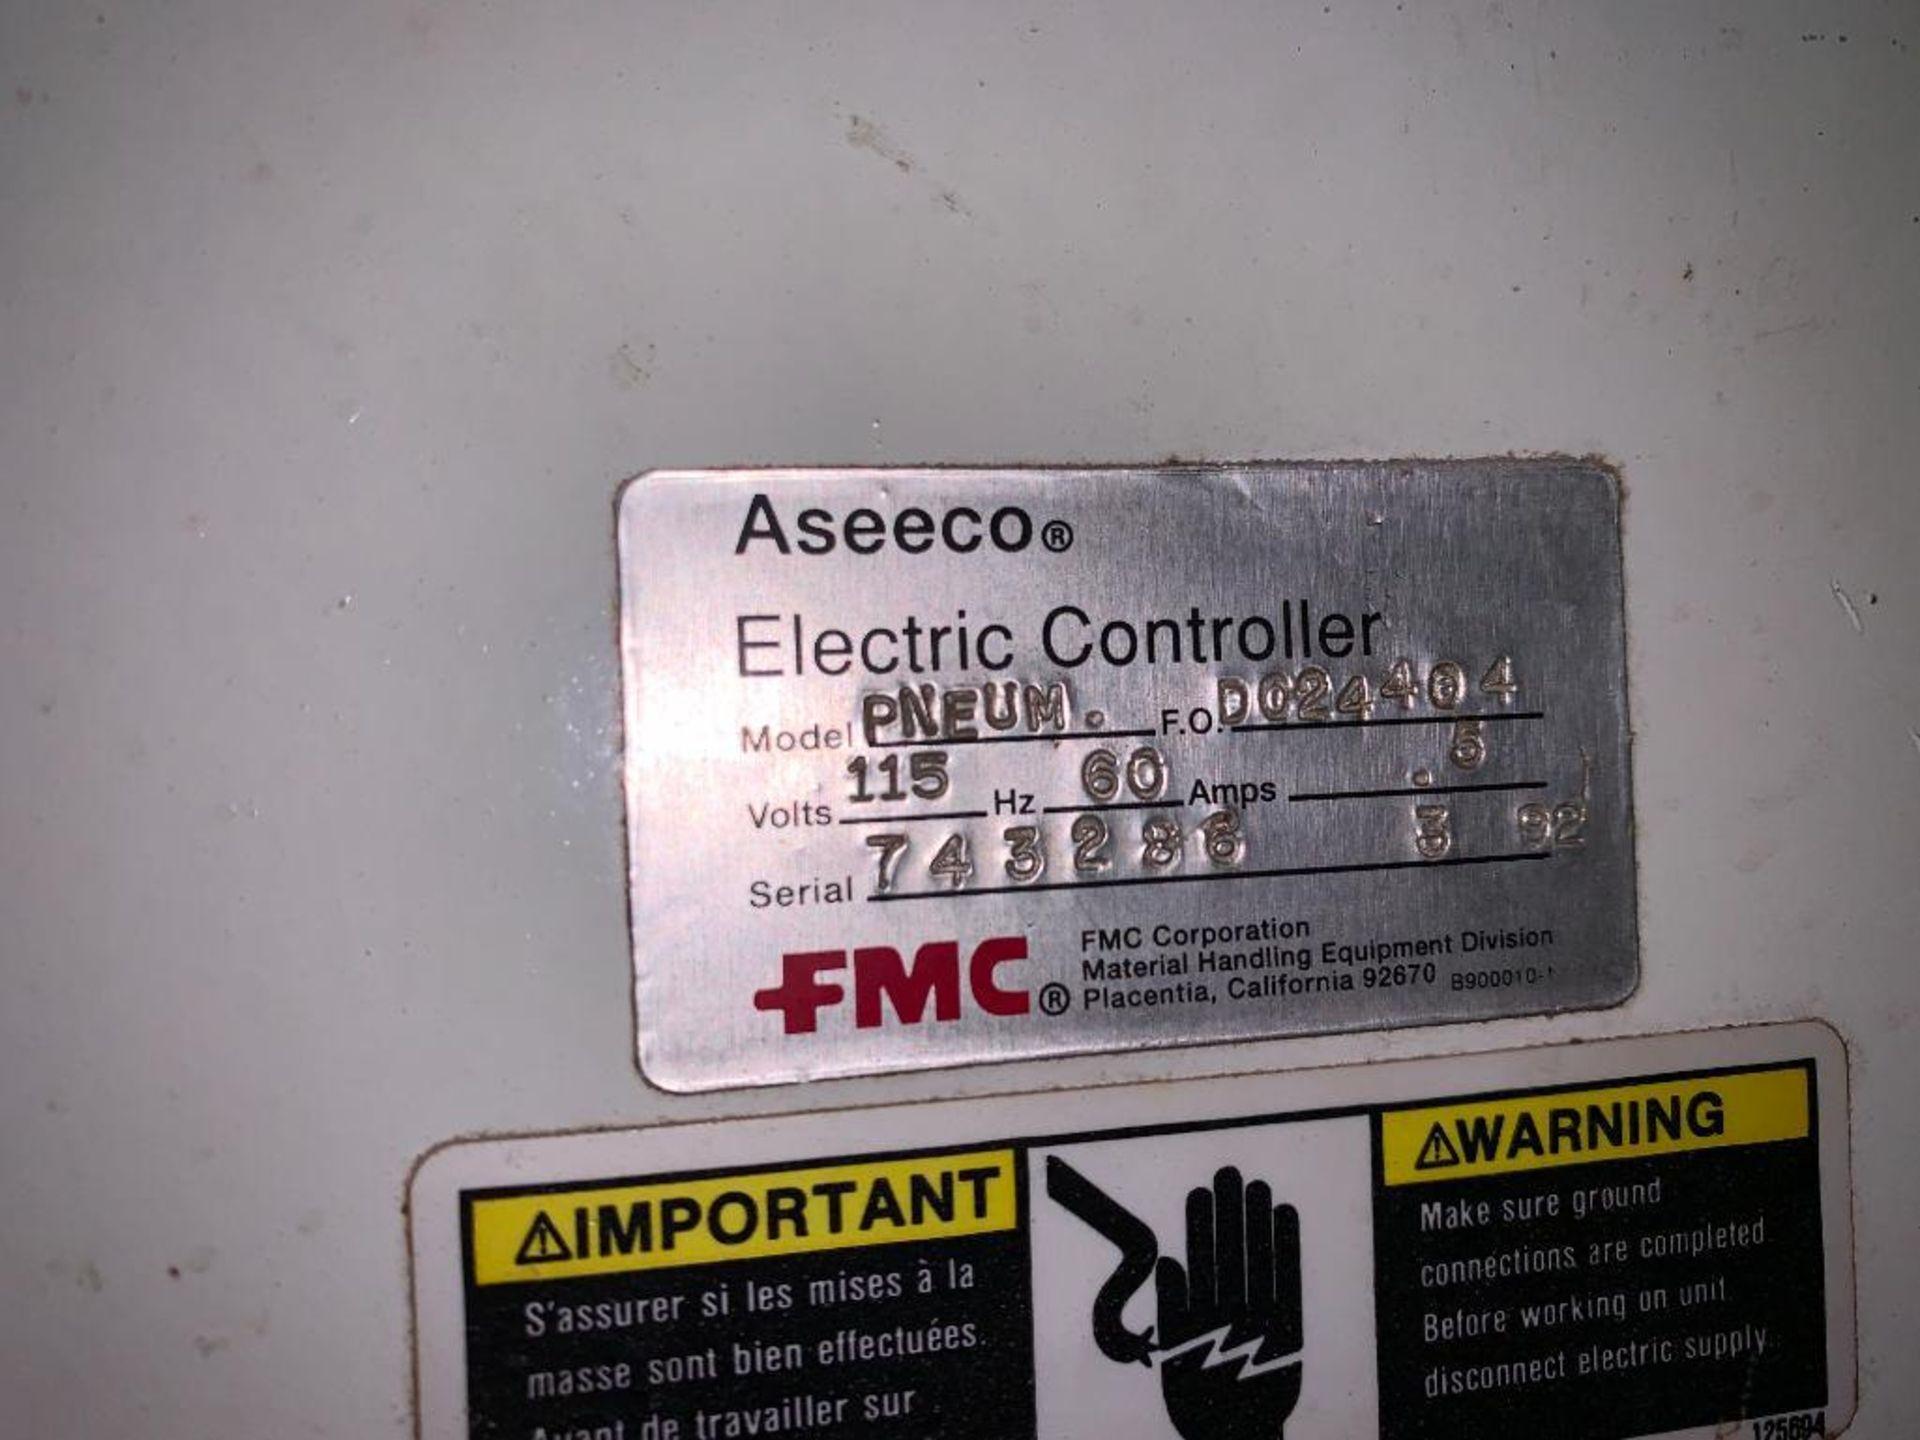 Aseeco mild steel cone bottom bulk storage bin - Image 19 of 22